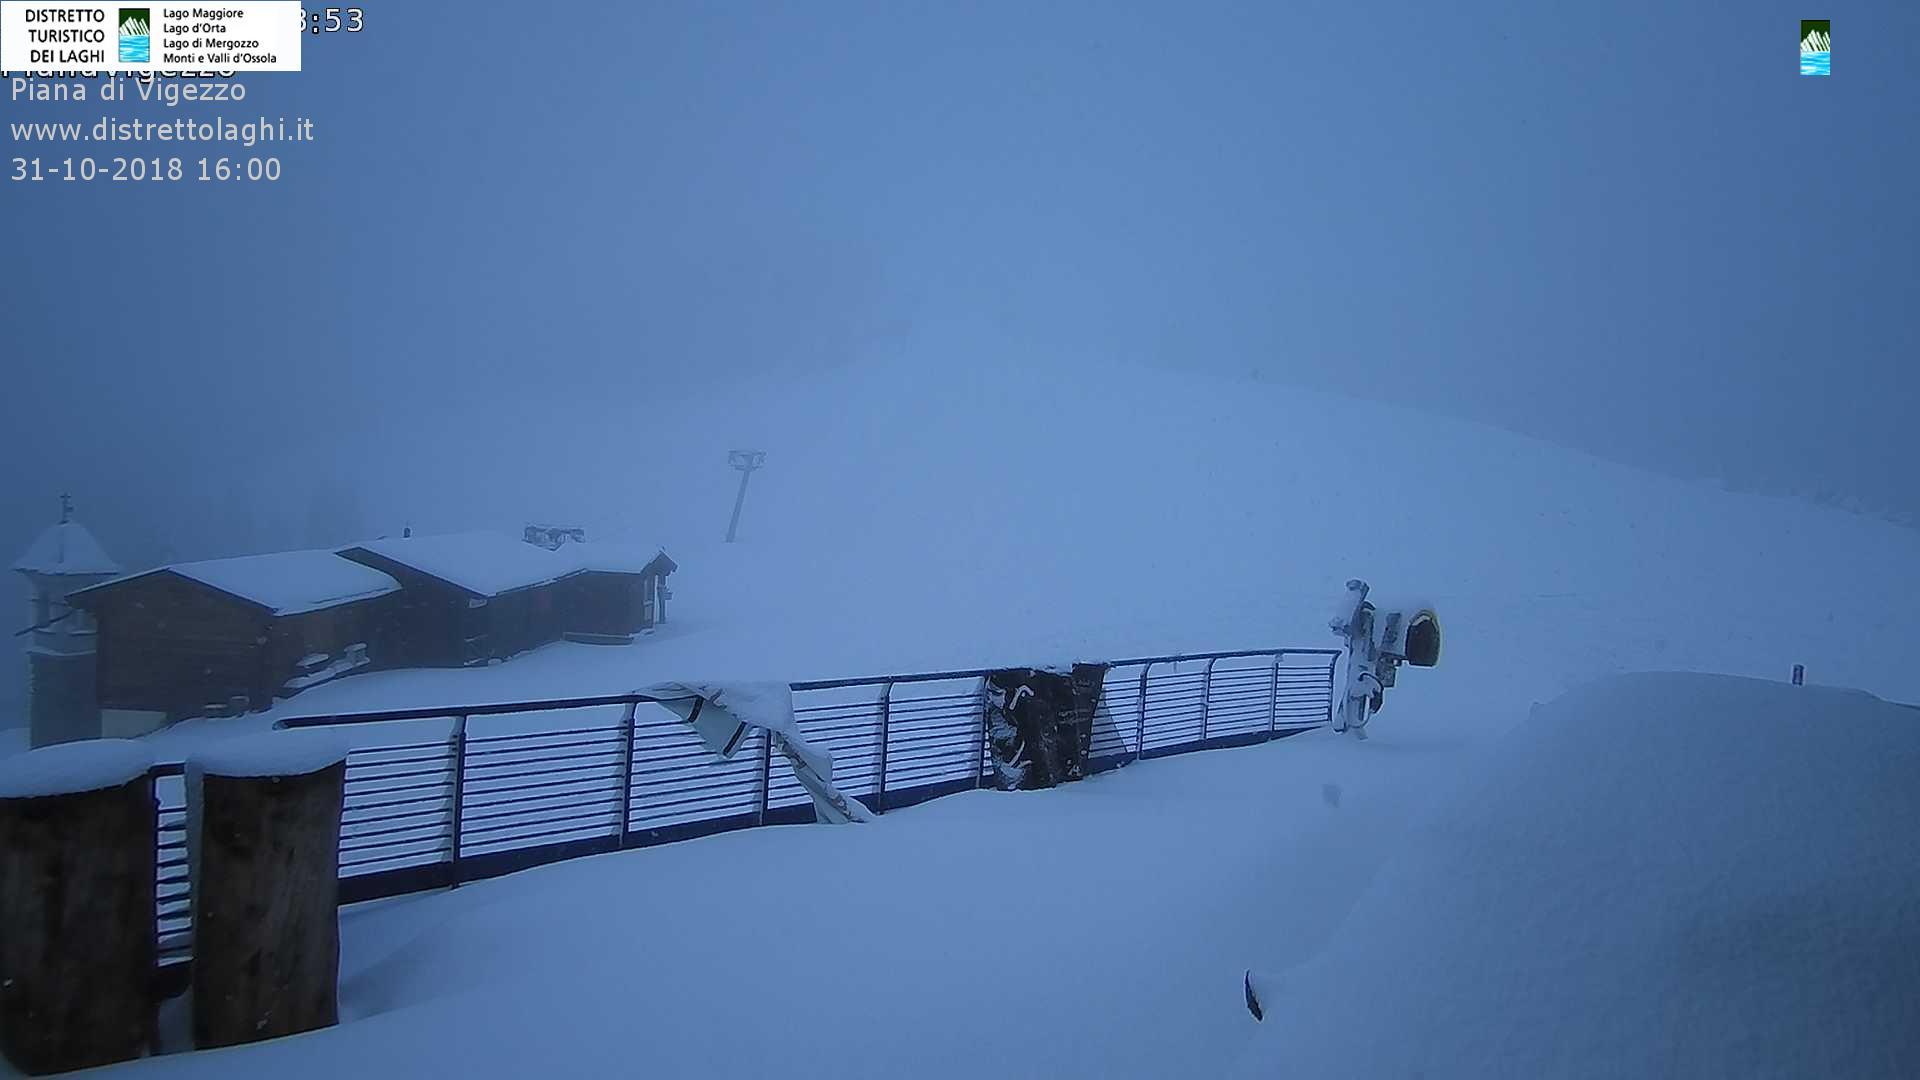 neve piana di Vigezzo